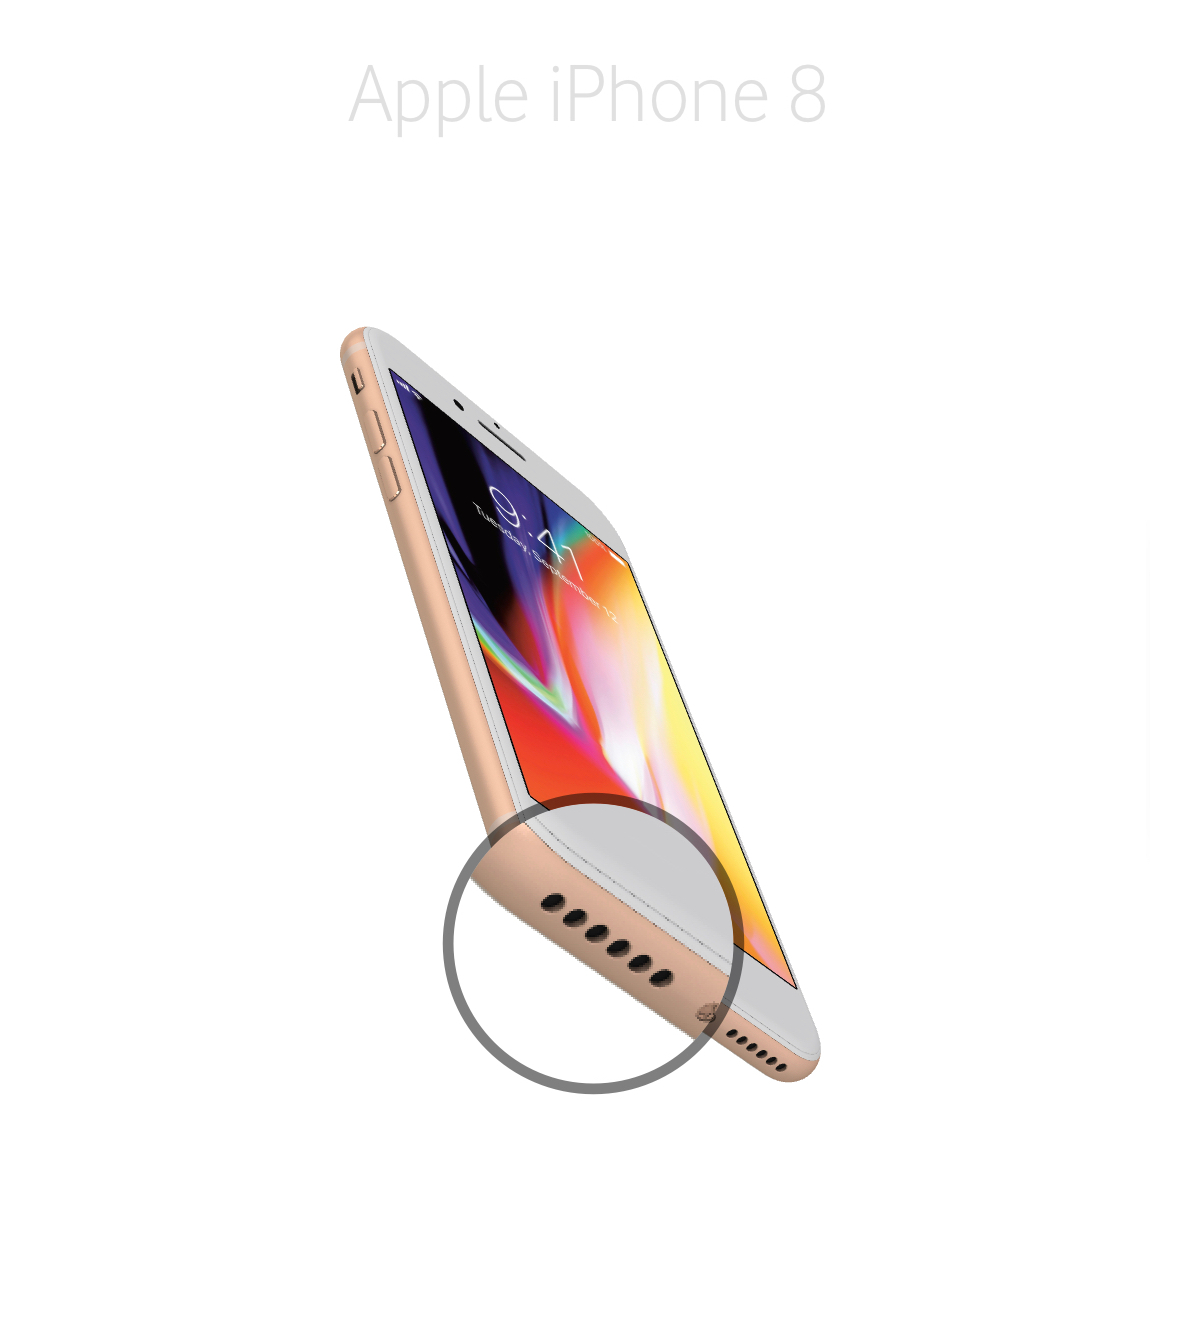 Laga mikrofon iPhone 8